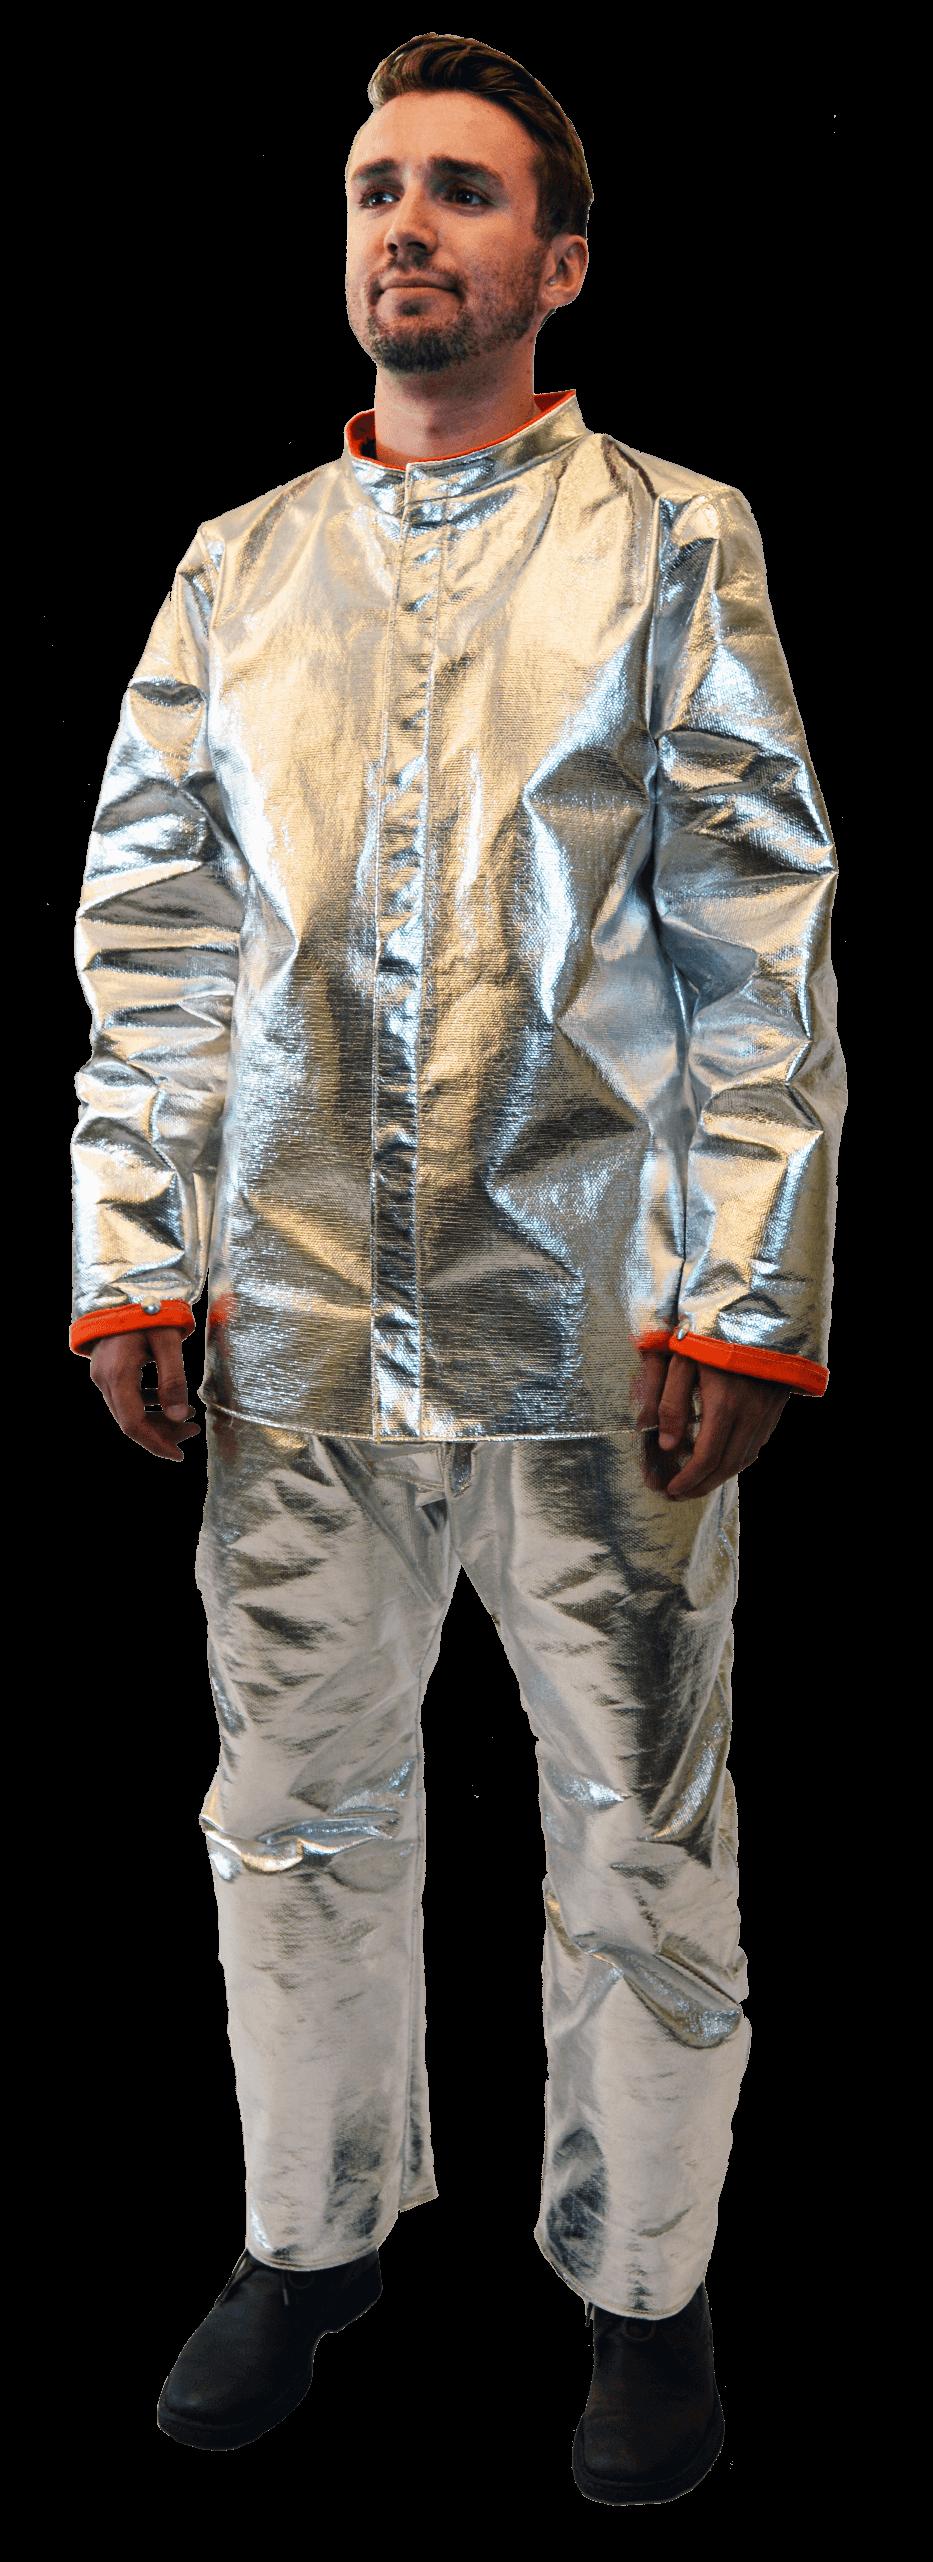 X10 Ultra-Lite Proximity Suit | Newtex